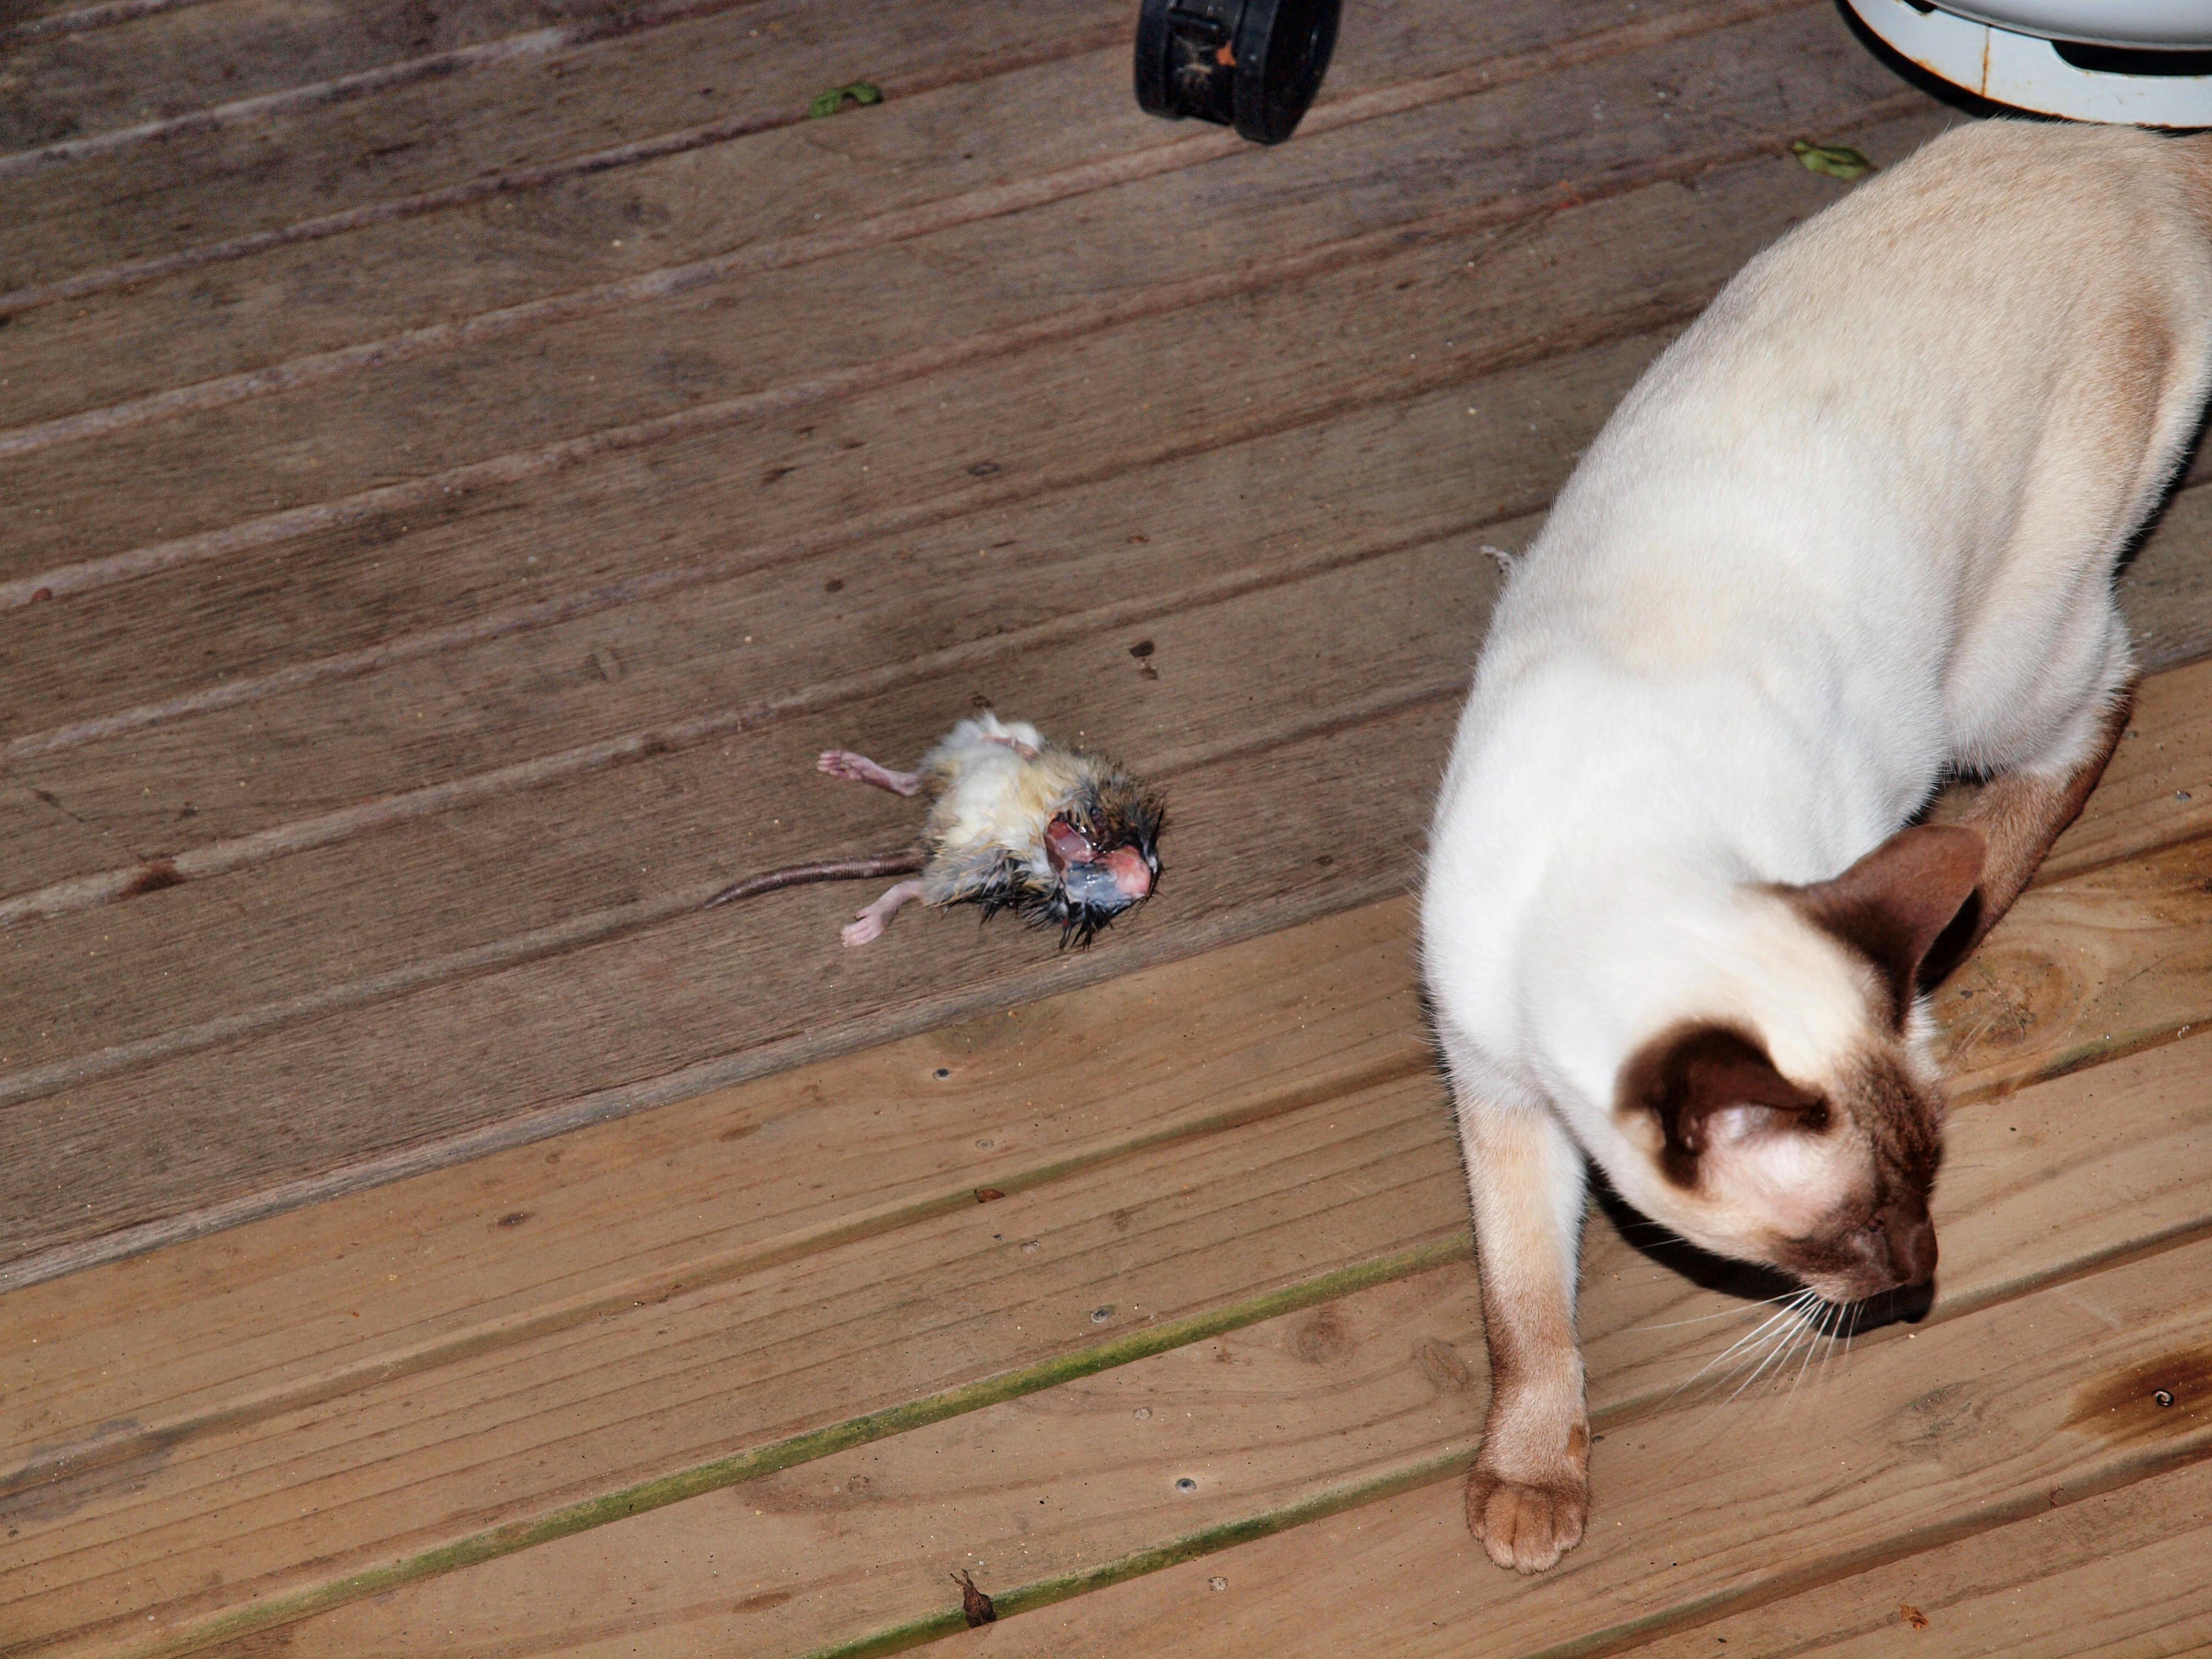 Piccola-and-rat-3.jpeg